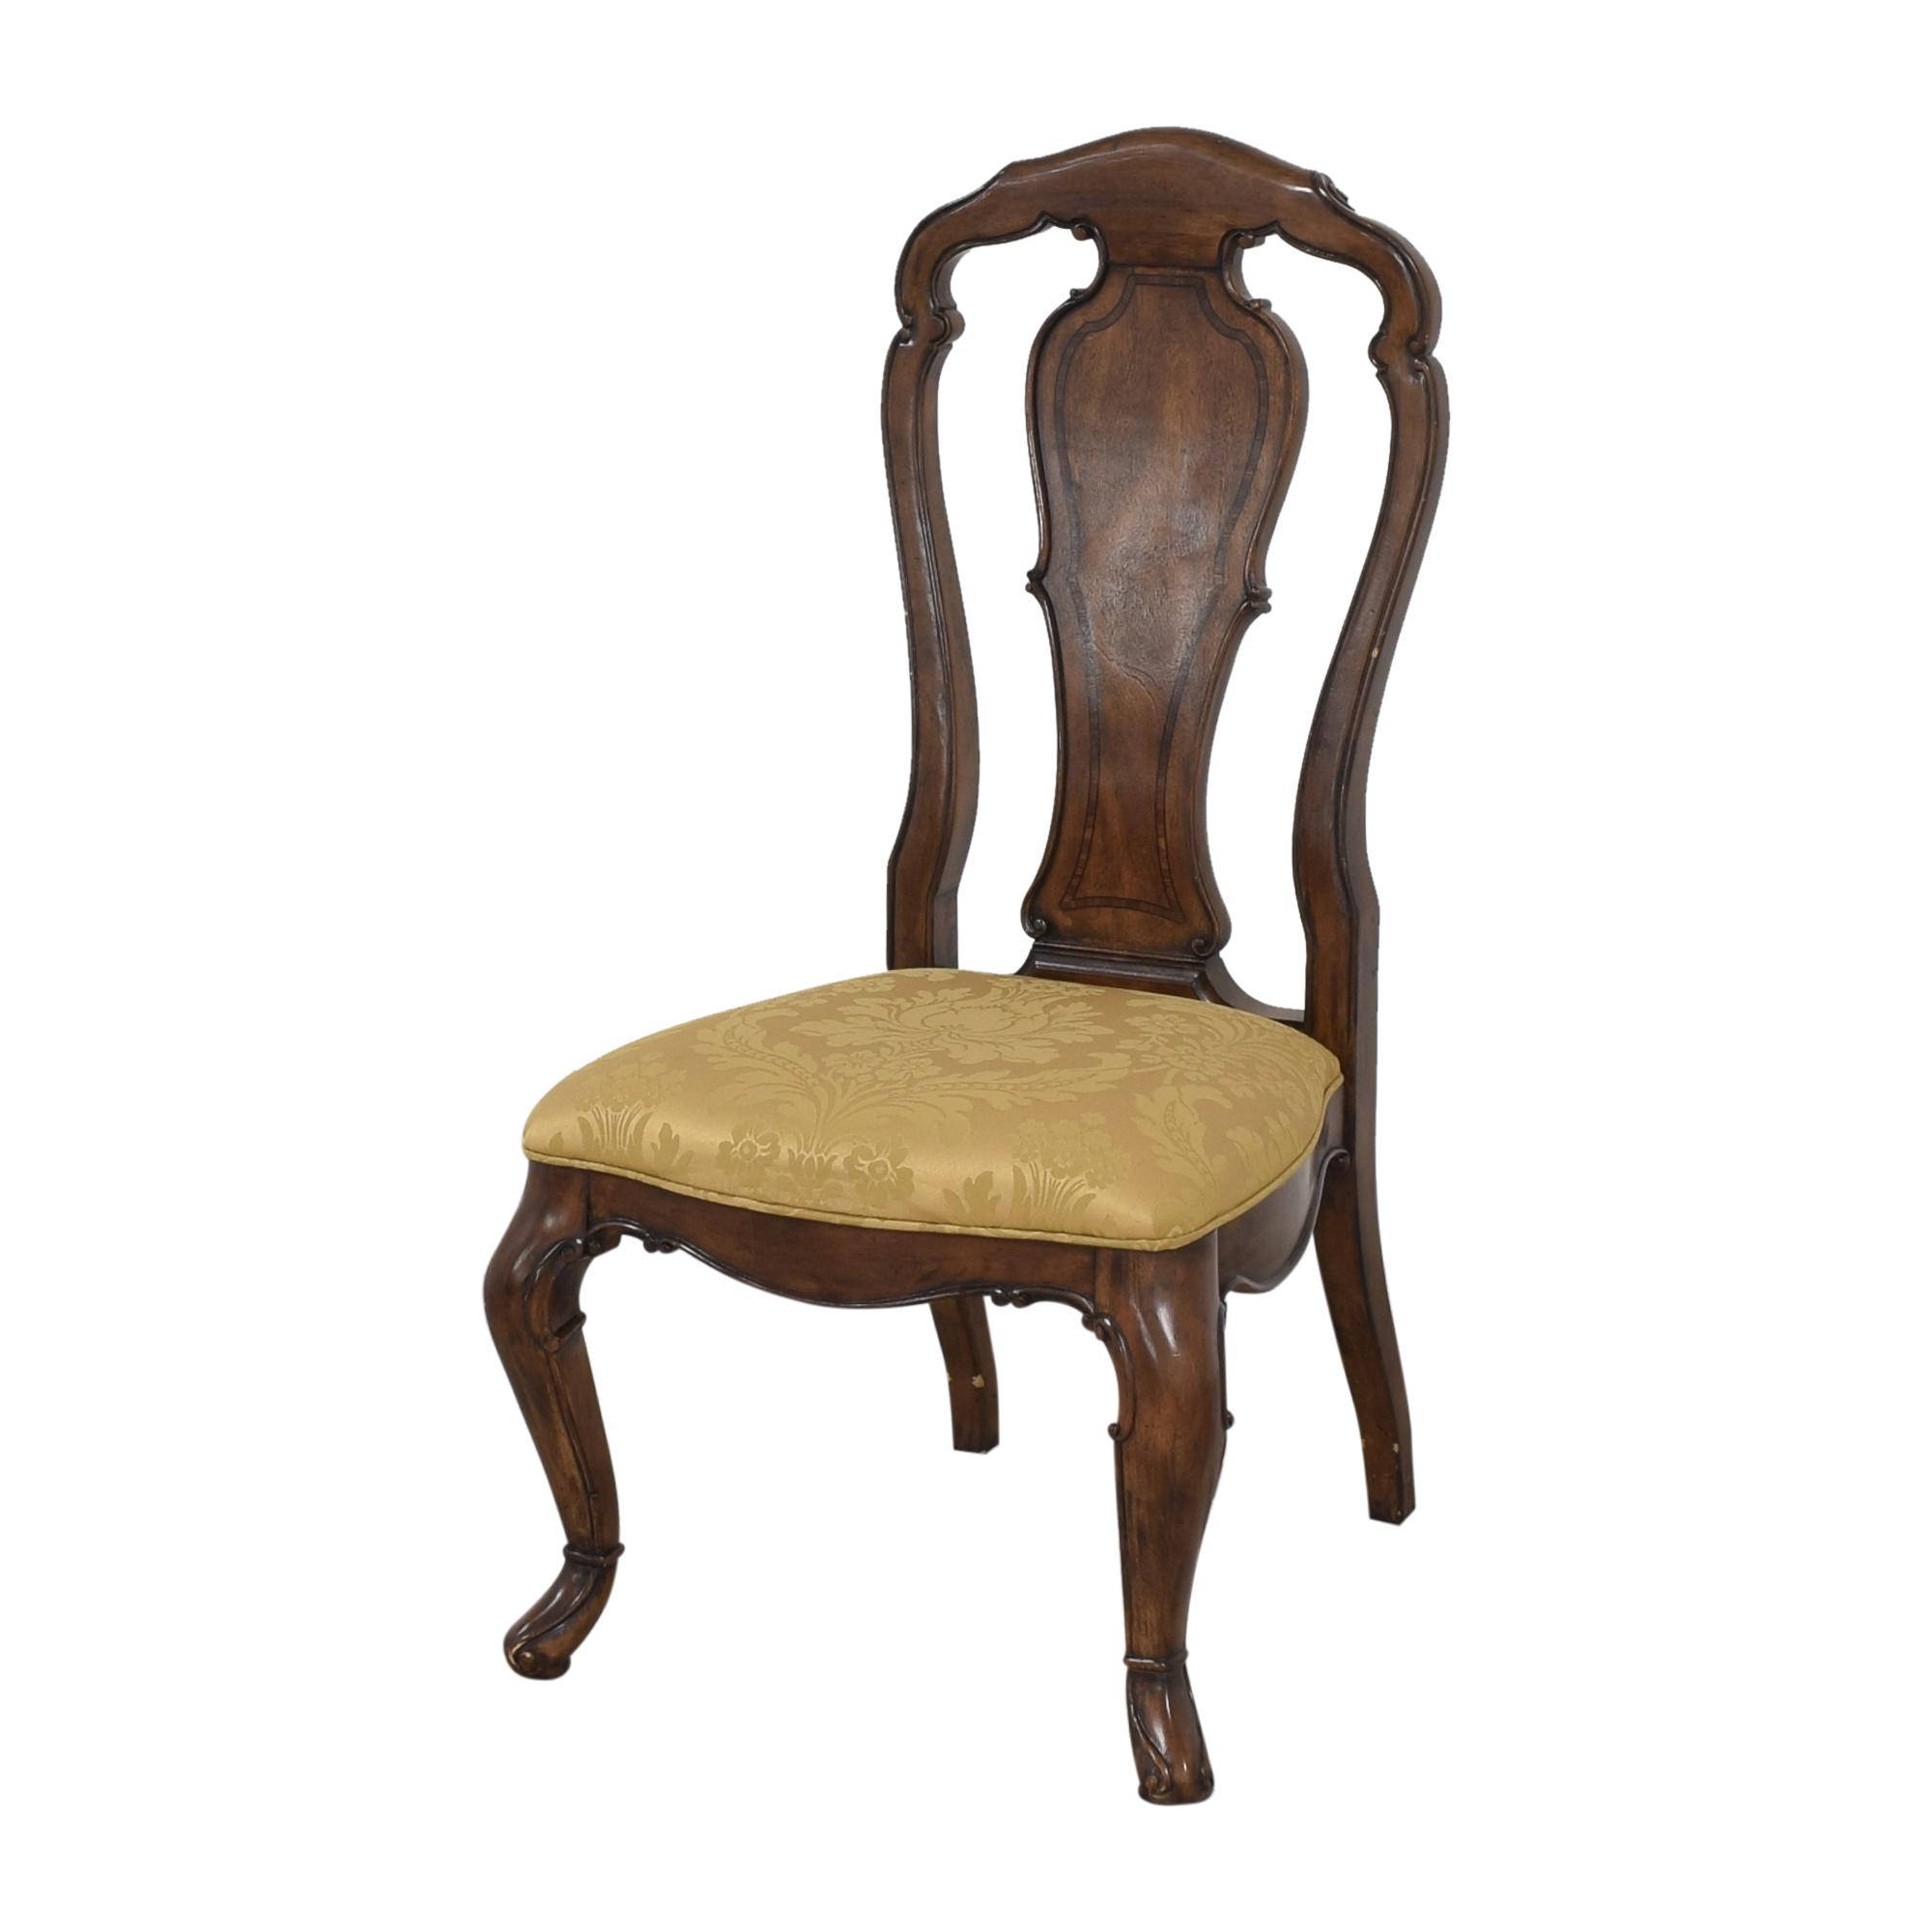 buy Thomasville Ernest Hemingway Granada Dining Chairs Thomasville Chairs